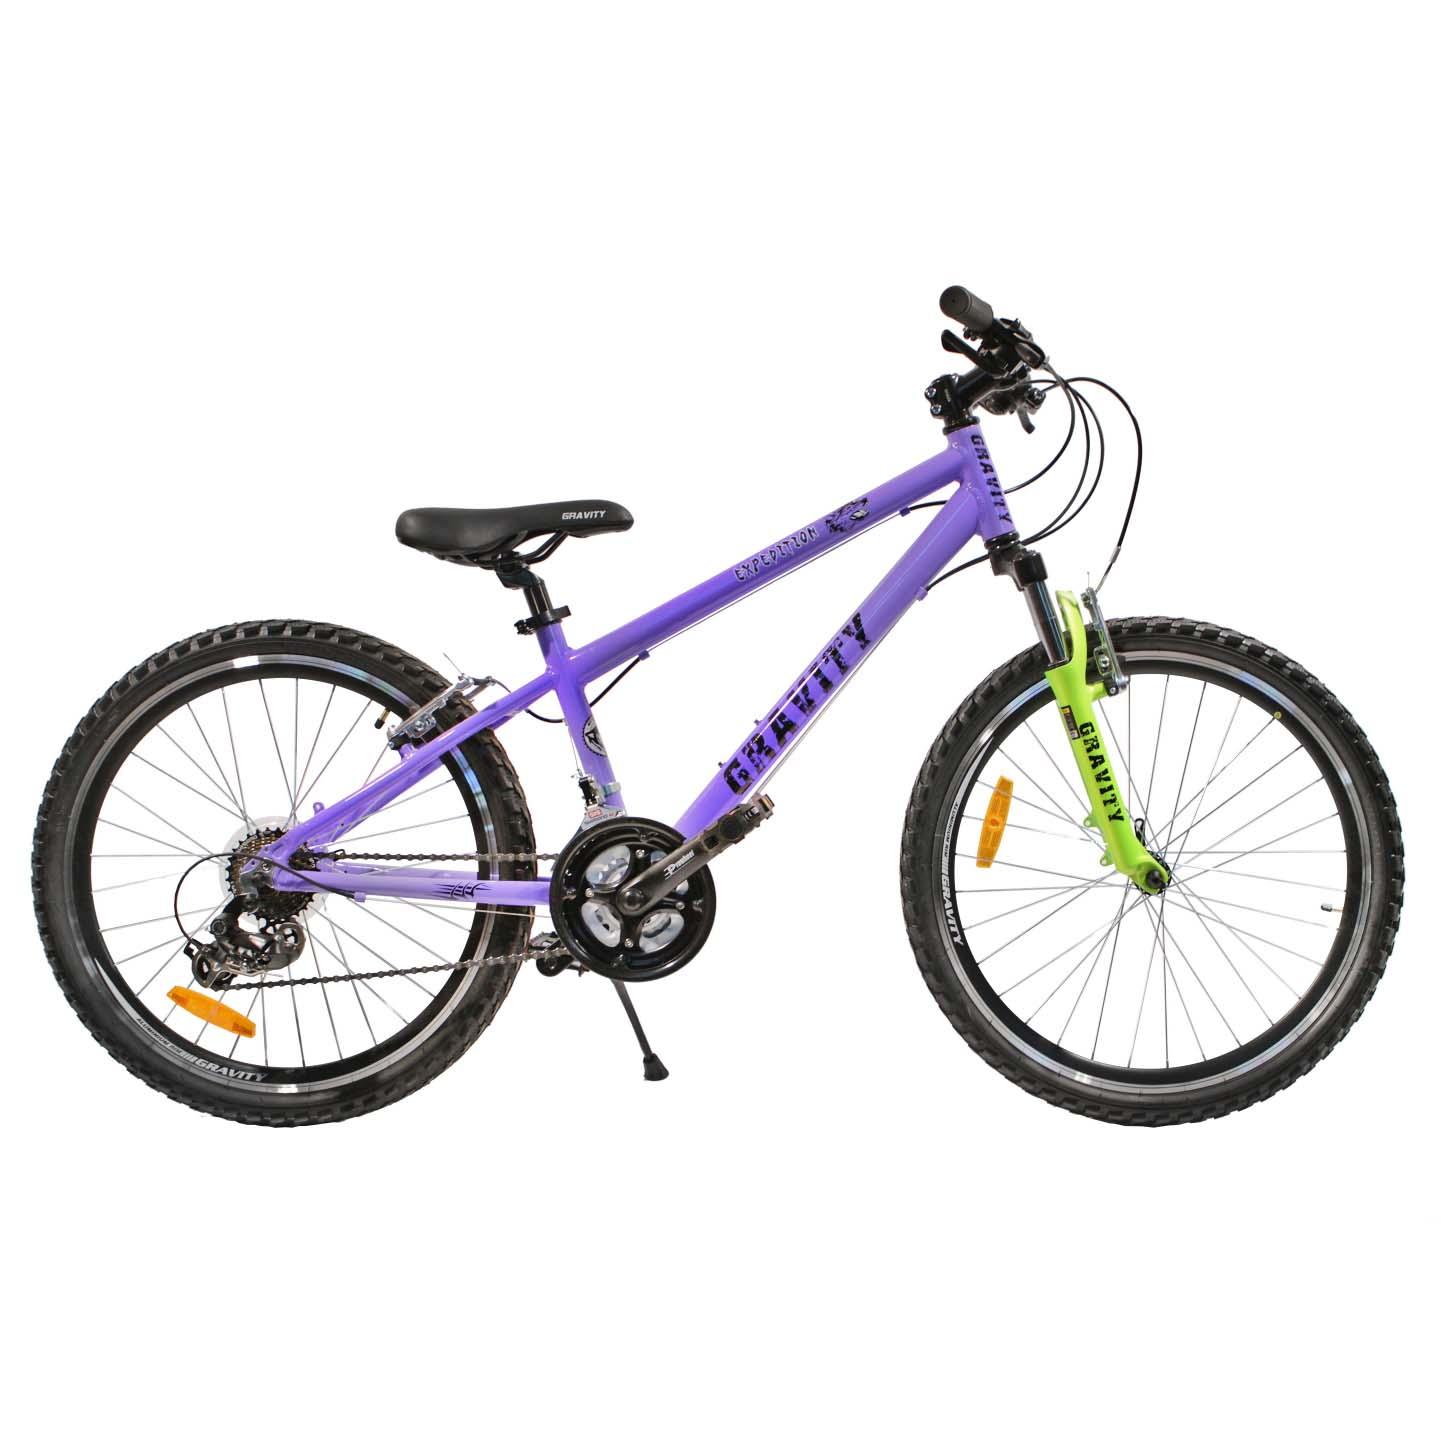 "Велосипед Gravity 24"" EXPEDITION 21 скор. алюм.рама 17"" сиреневый (7406)"